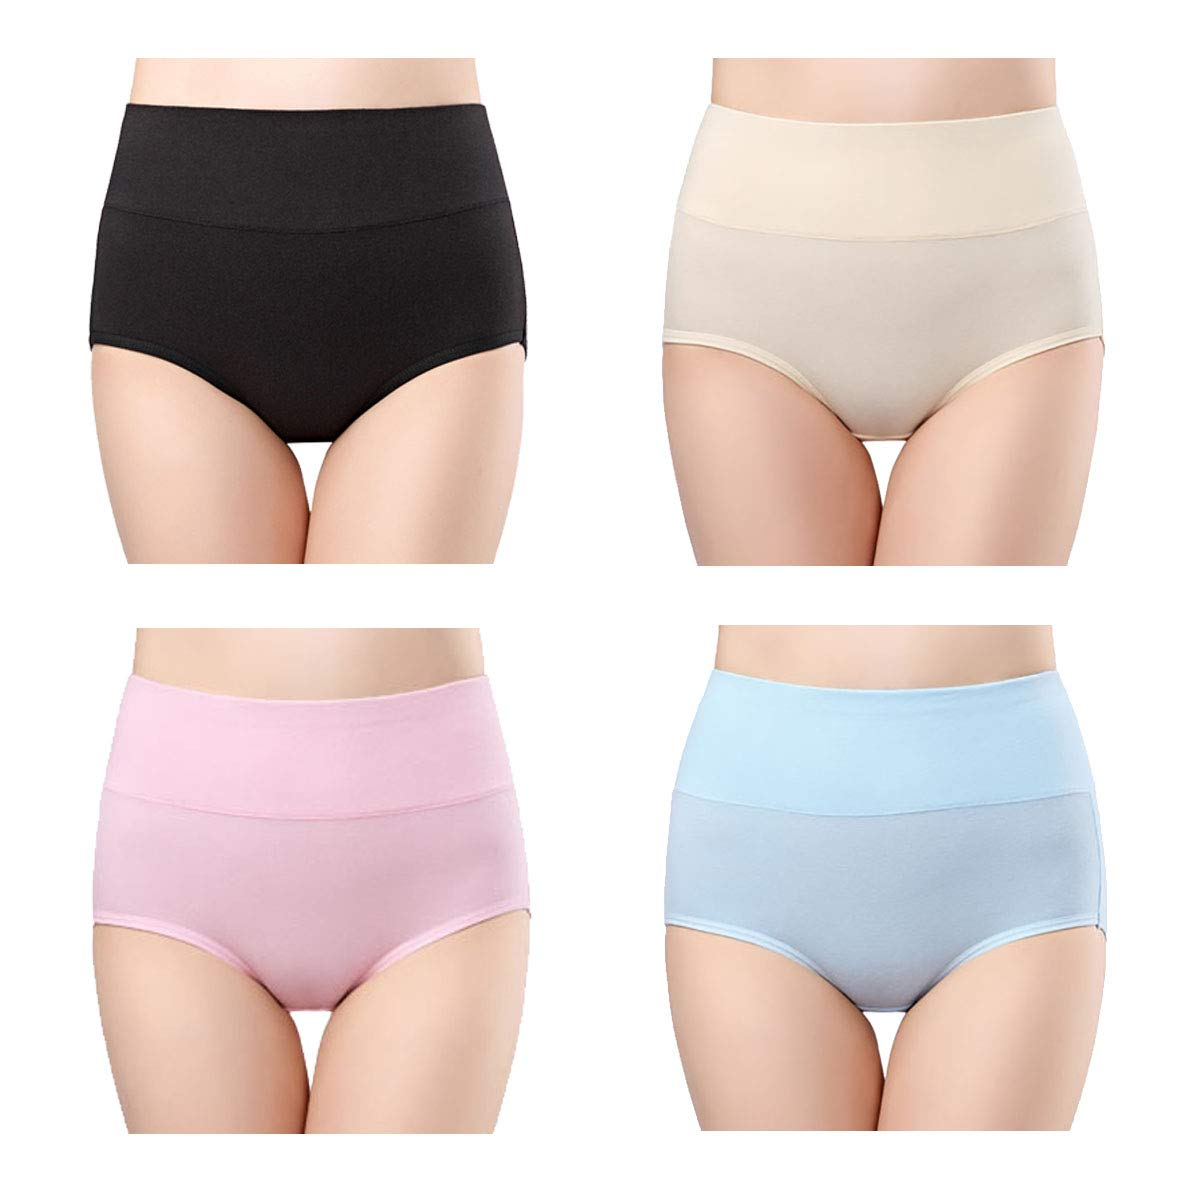 d33a24c48a45 Galleon - Wirarpa Women's Cotton Underwear 4 Pack High Waisted Briefs No  Muffin Top Ladies Comfort Panties Size 6, Medium